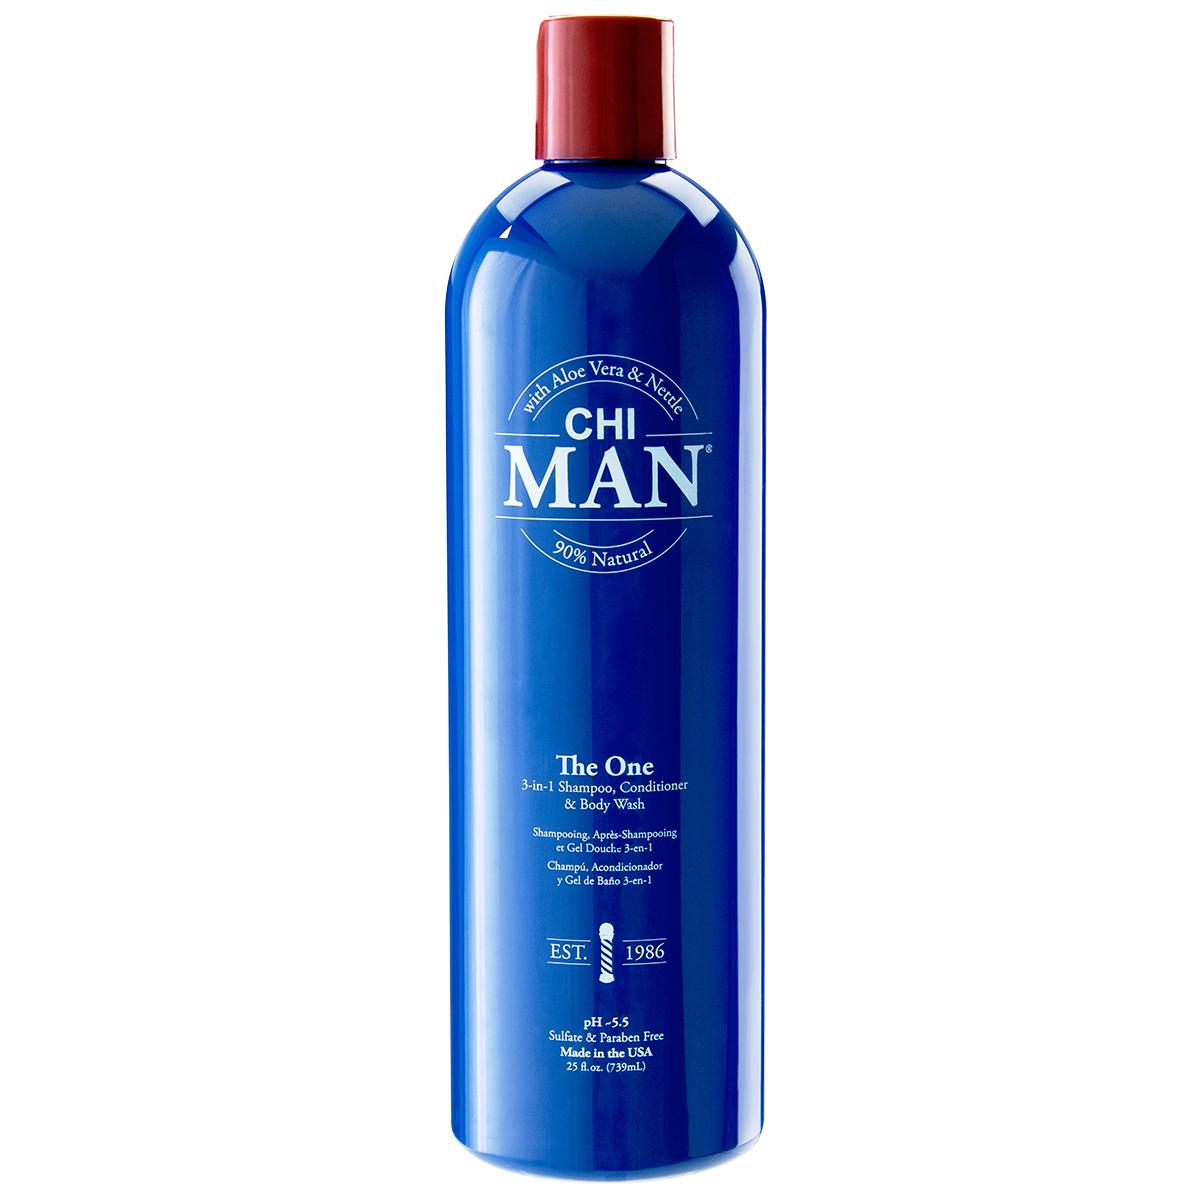 ШАМПОАН 3 В 1 CHI Man The One 3-in-1 Shampoo, Conditioner & Body Wash 739ml